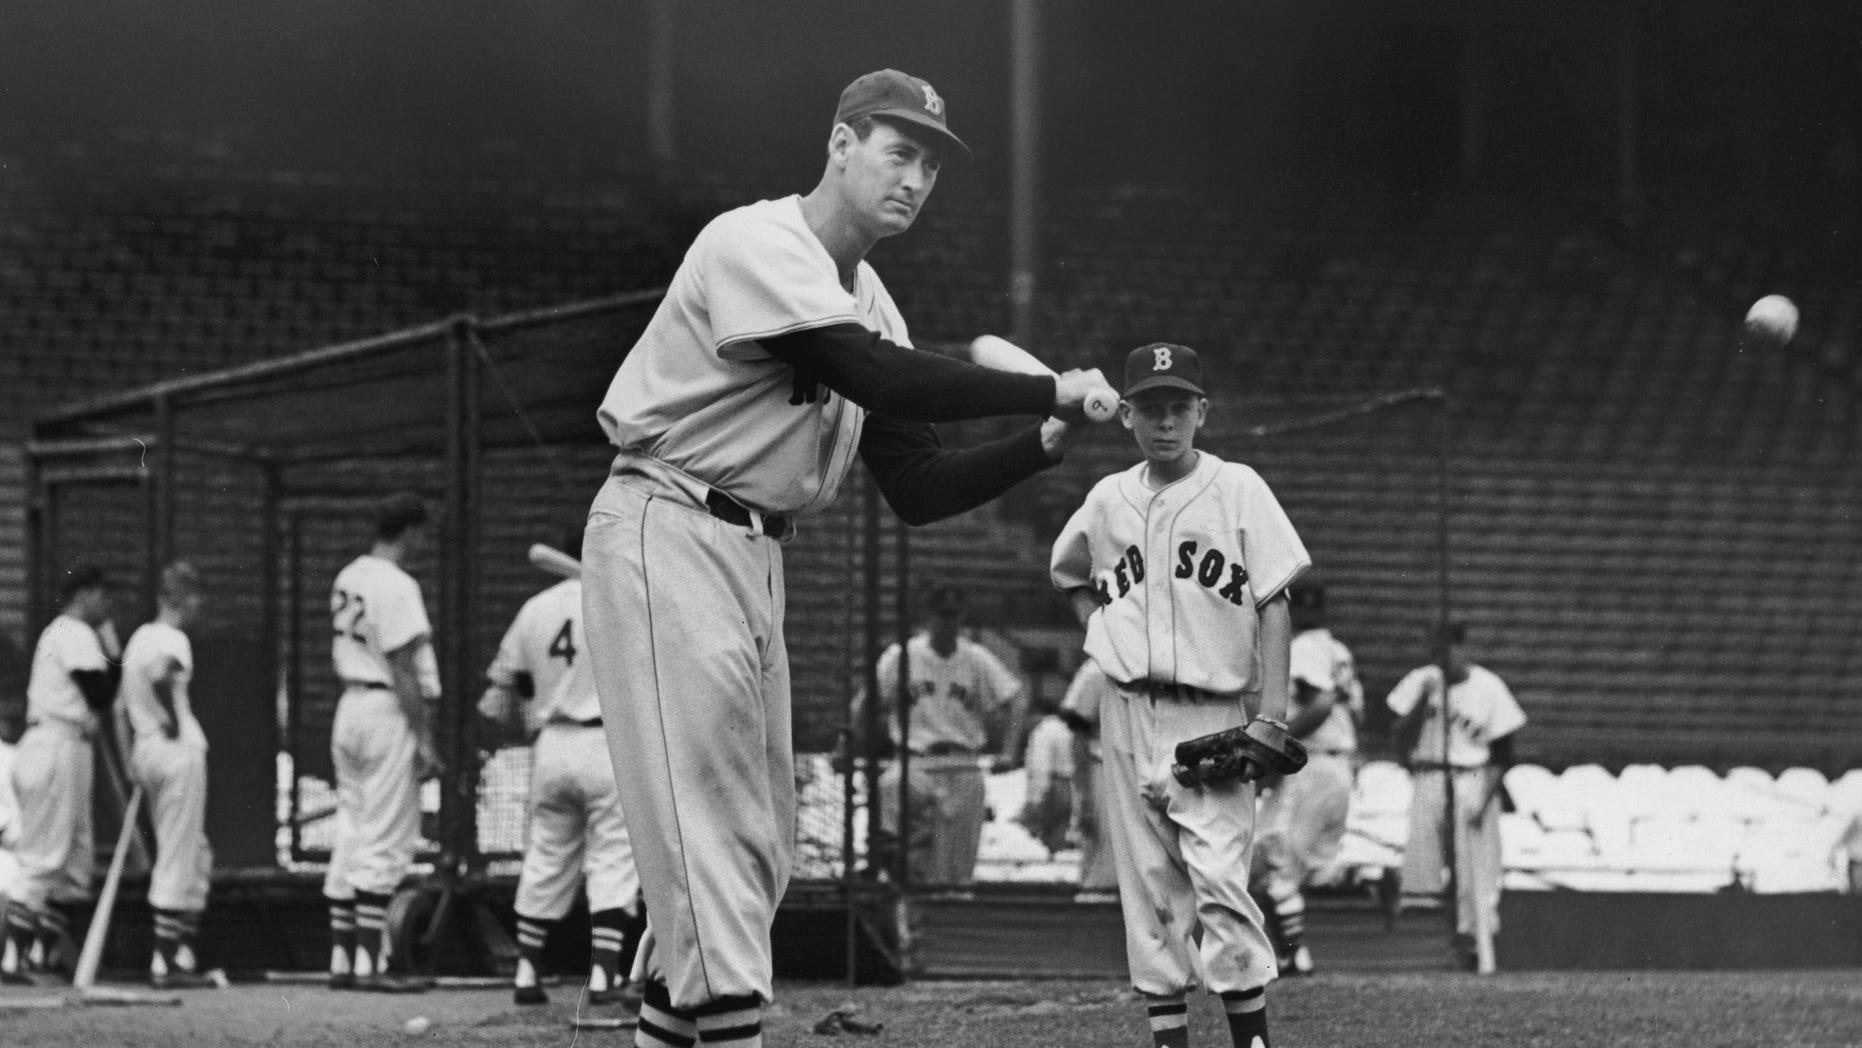 Baseball legend Ted Williams circa 1945.